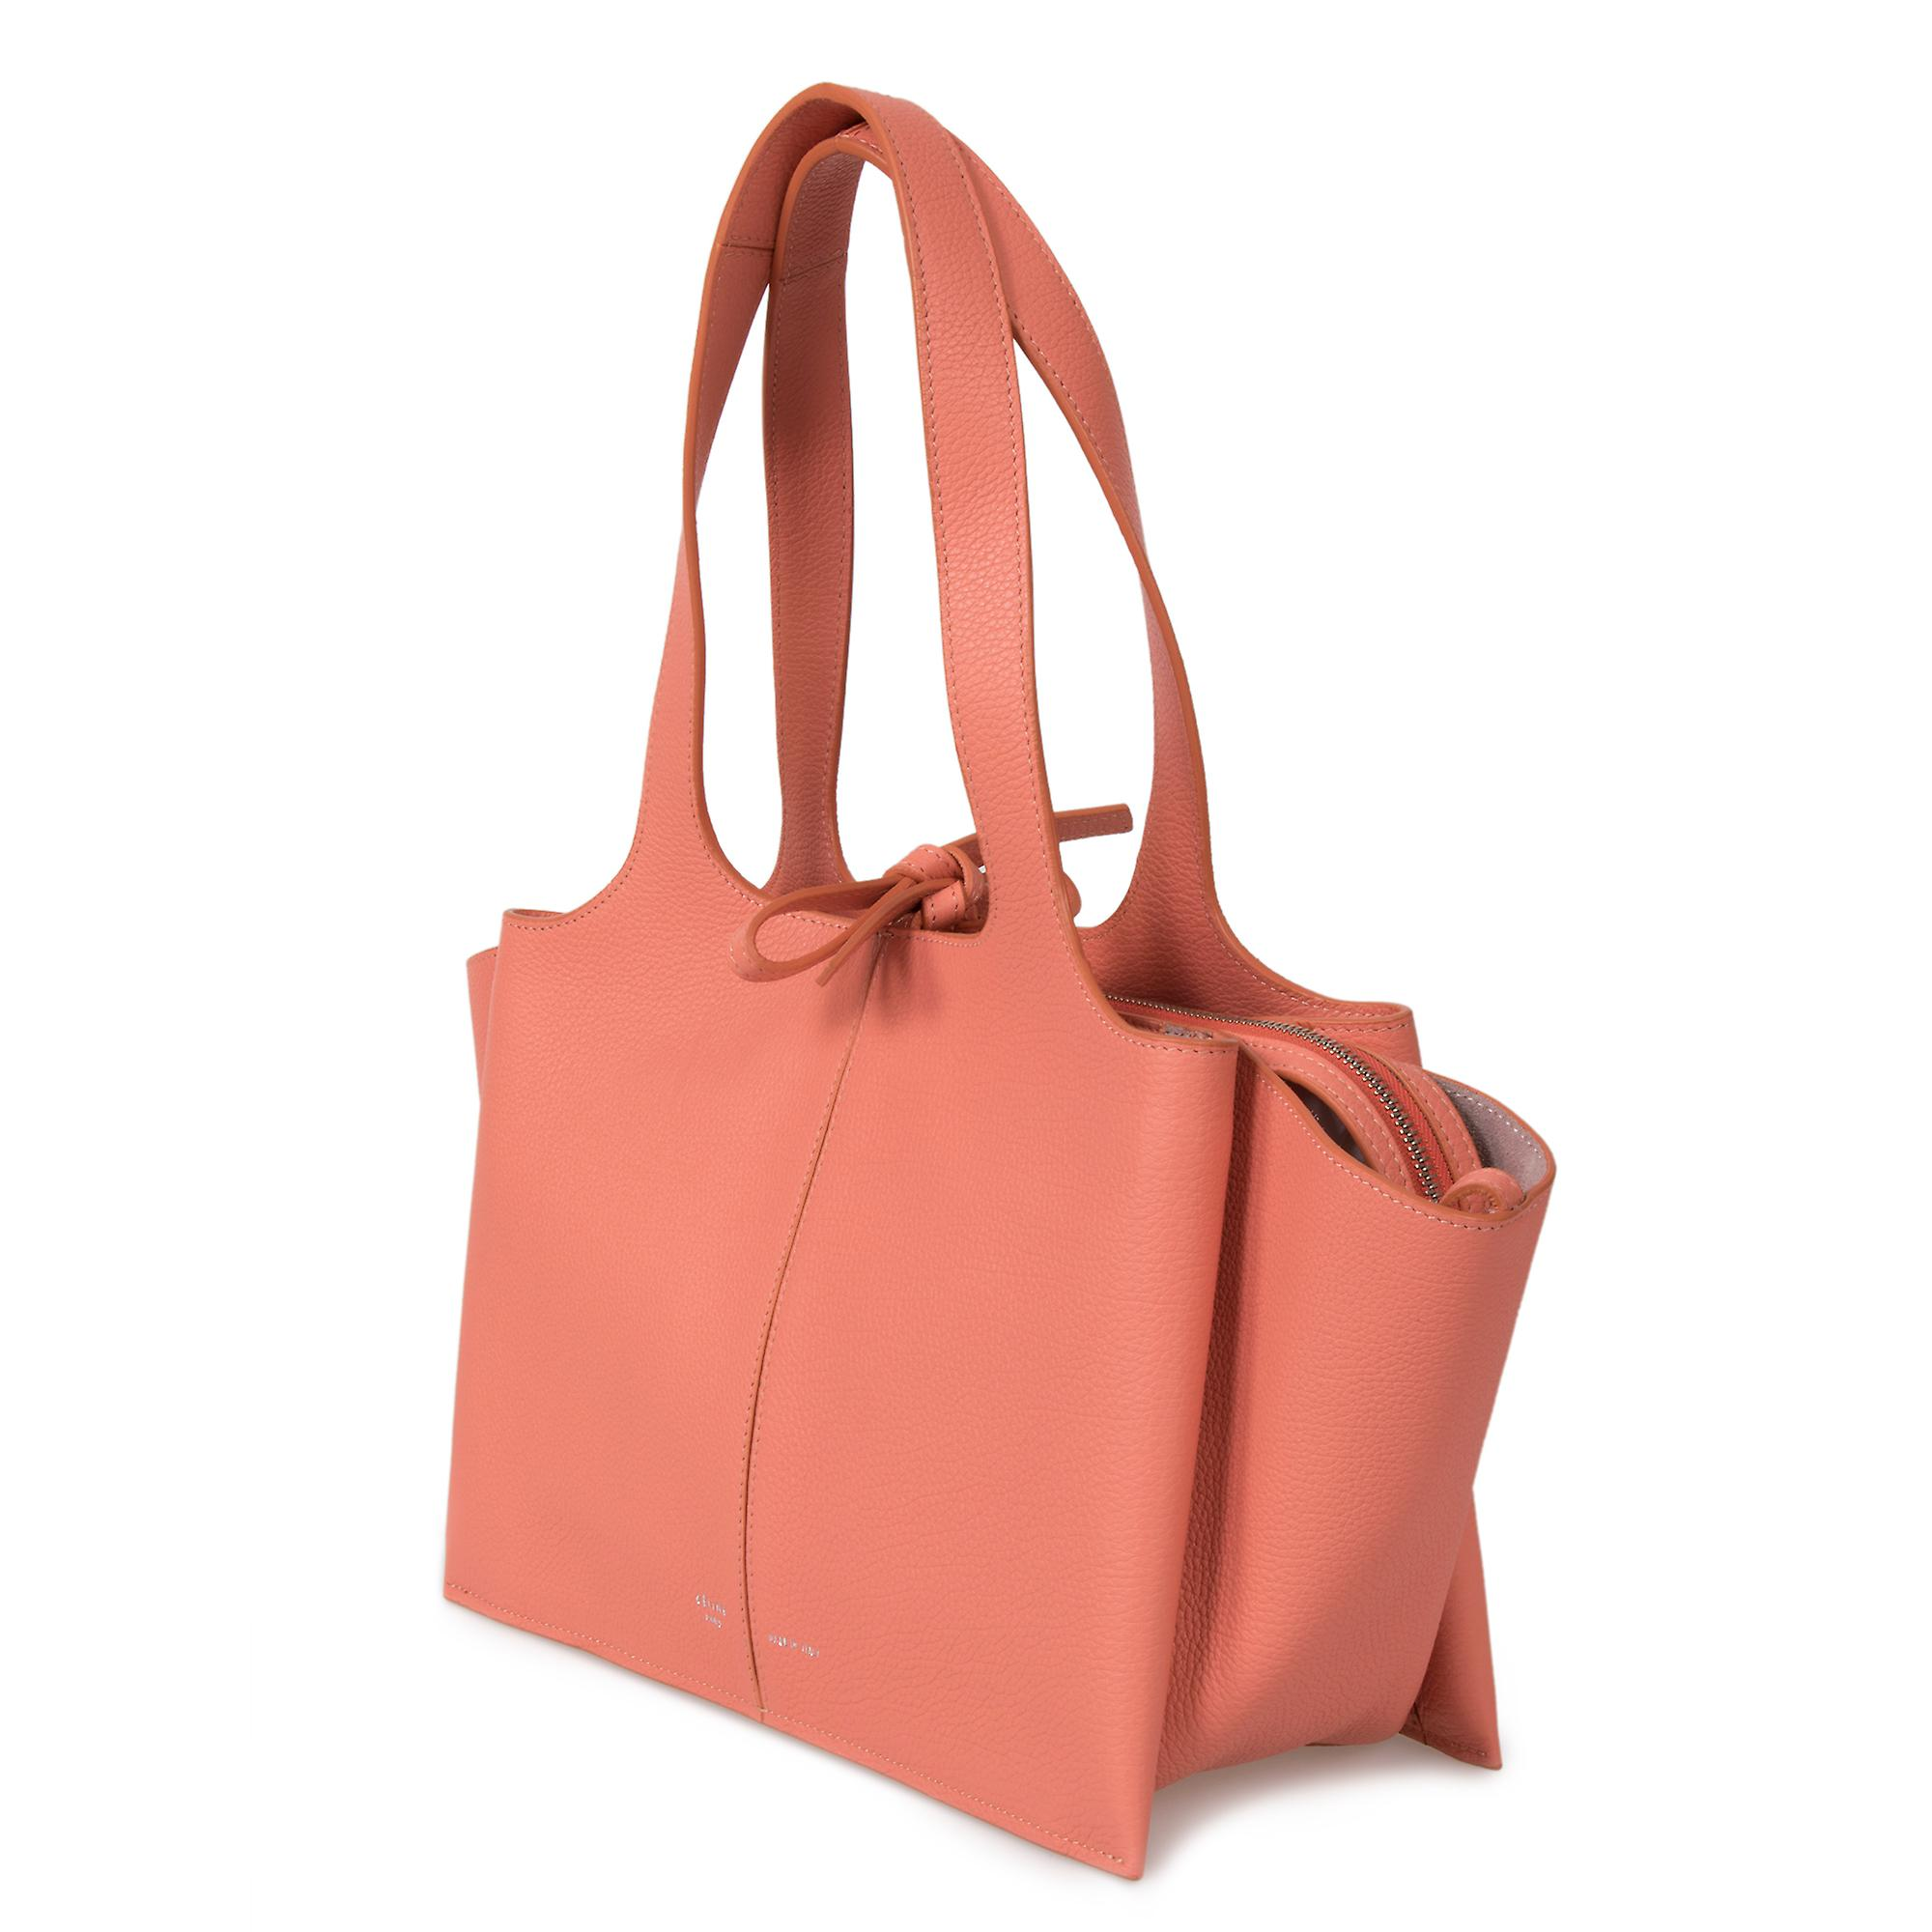 Celine Tri-Fold Shoulder Bag | Peach Grained Calfskin Leather